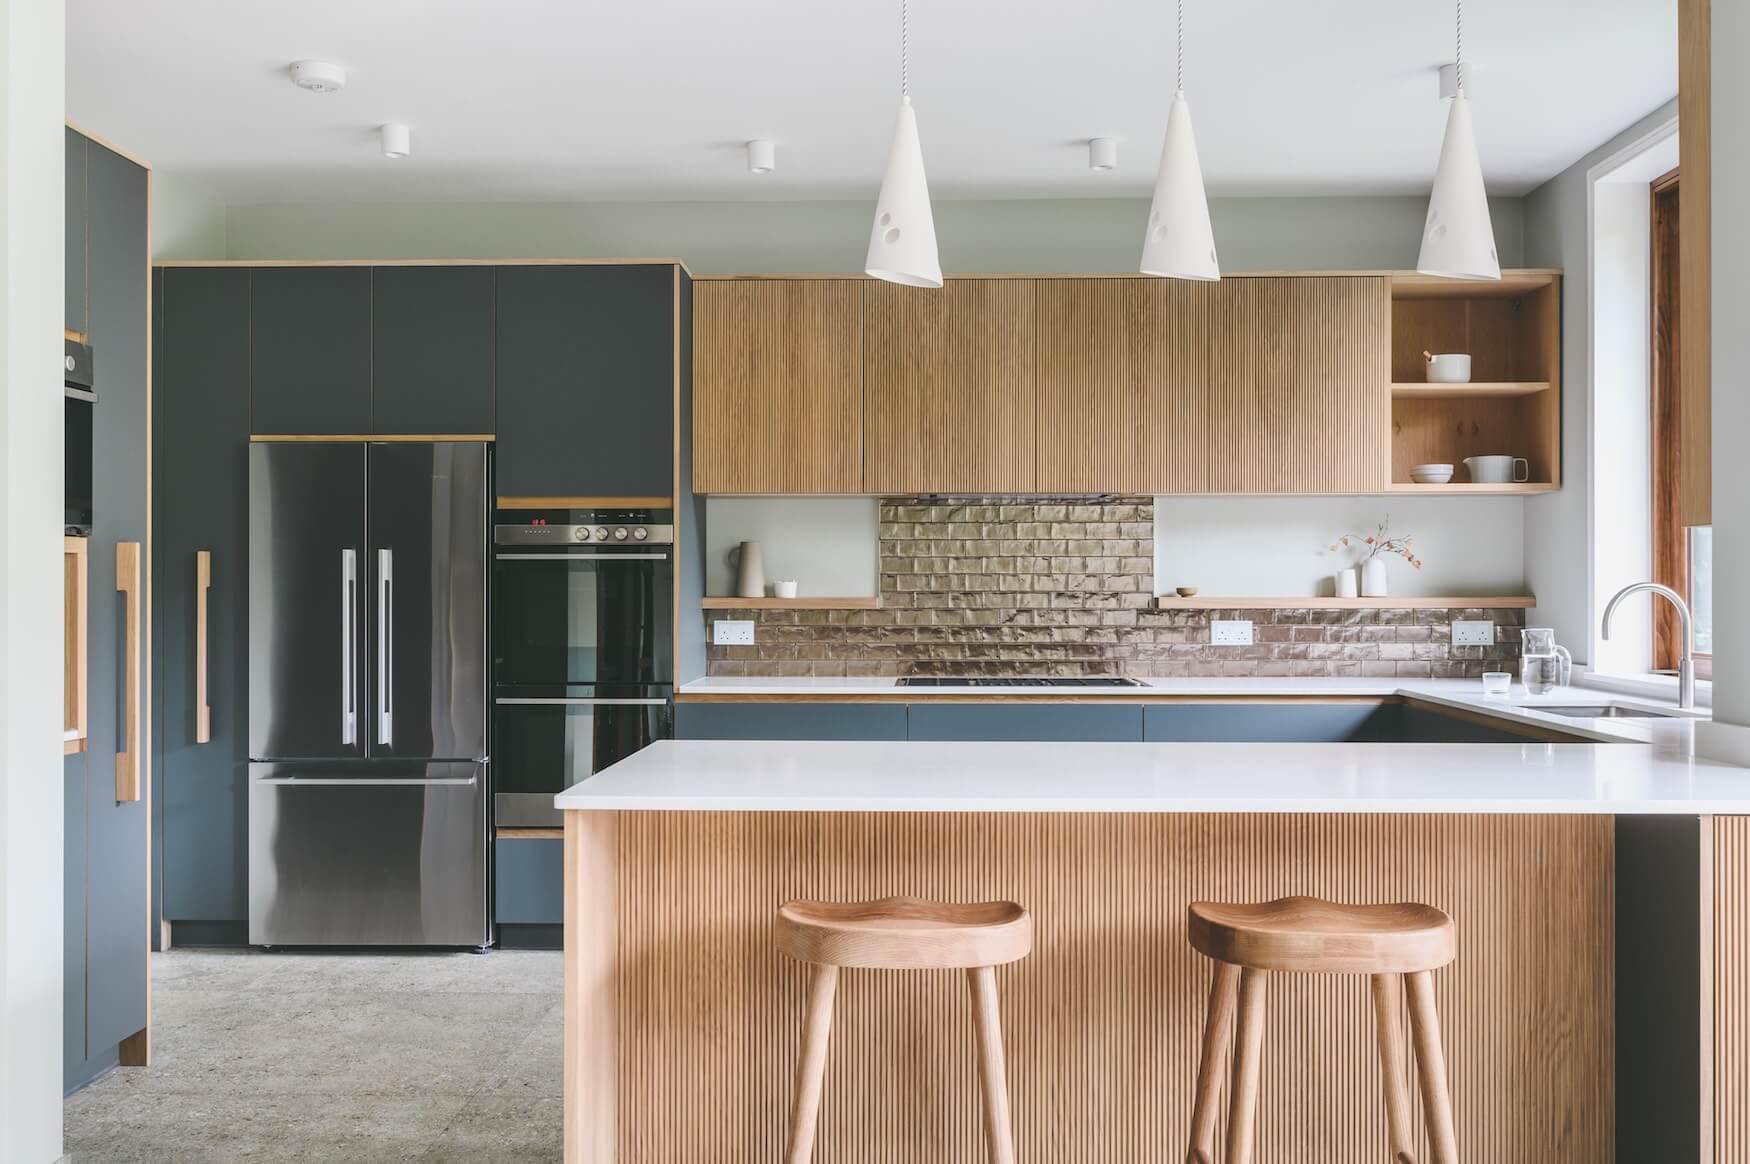 Rochlin Bespoke beautiful handcrafted kitchens